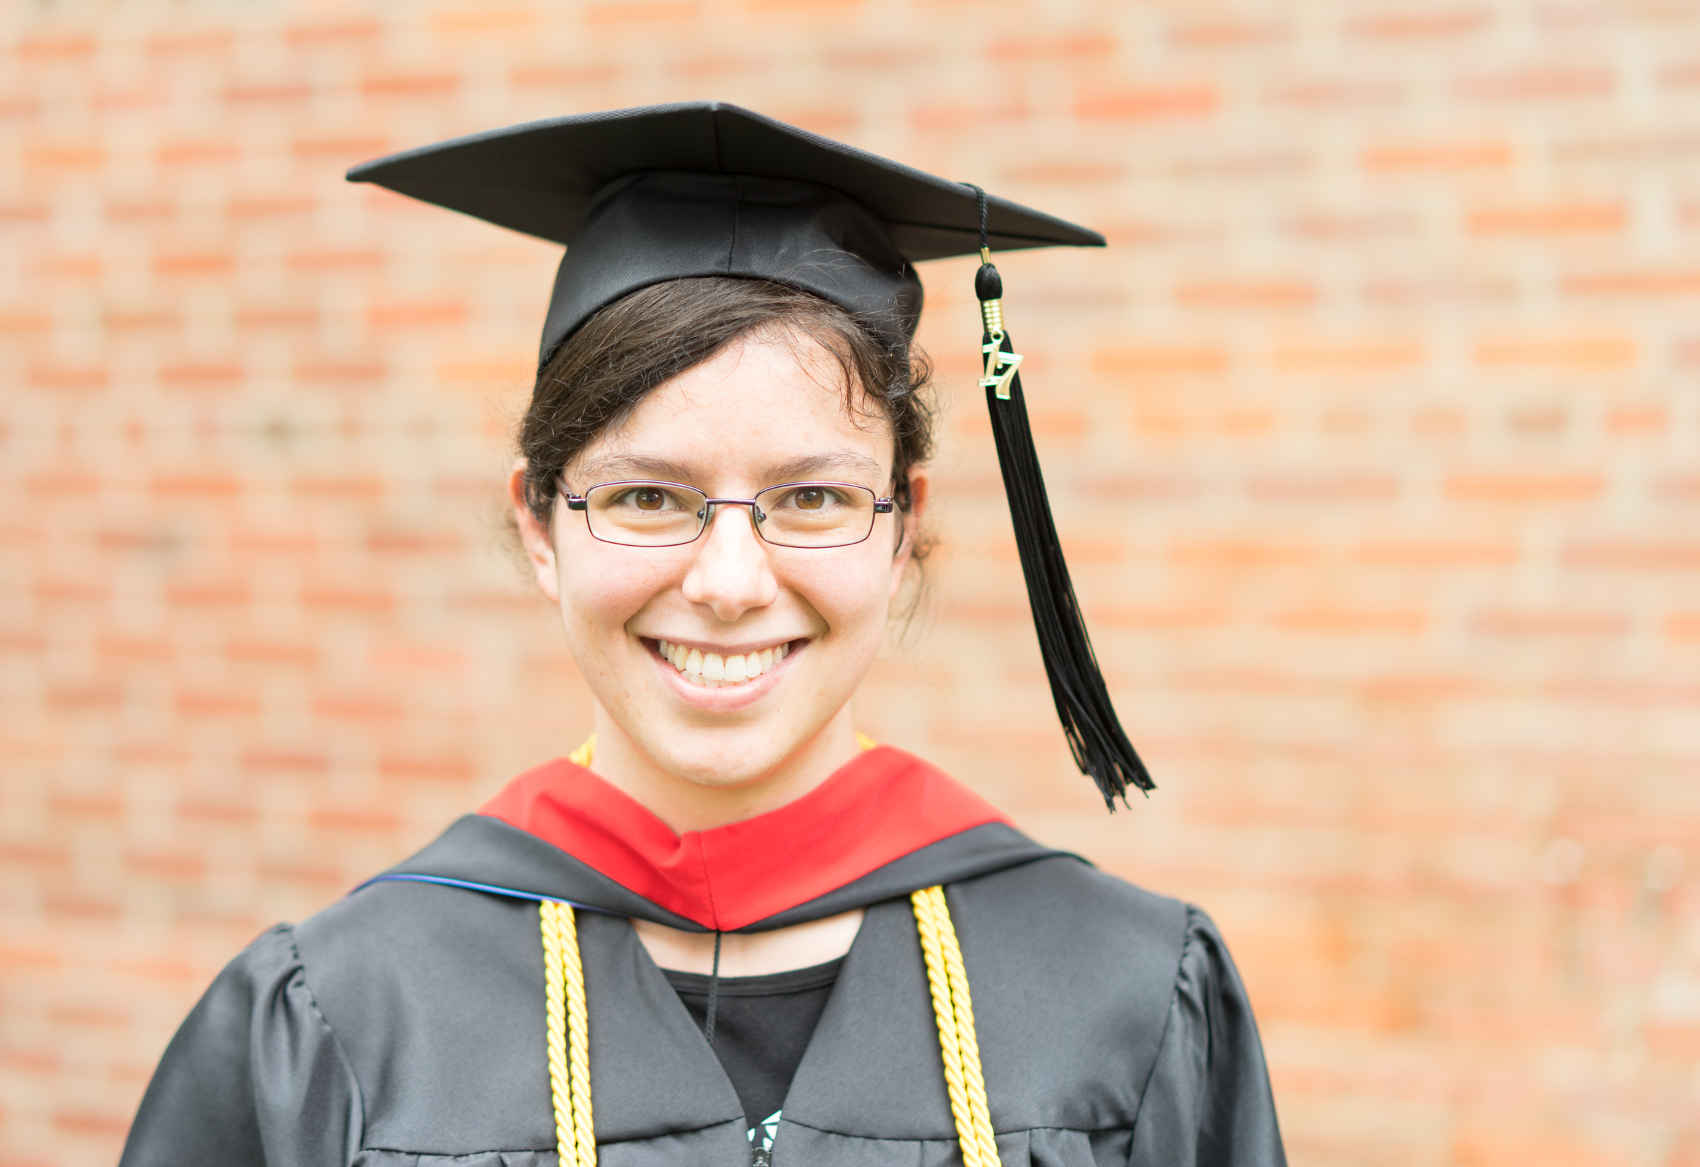 Maricka Herrer - GBSC's first Masters graduate